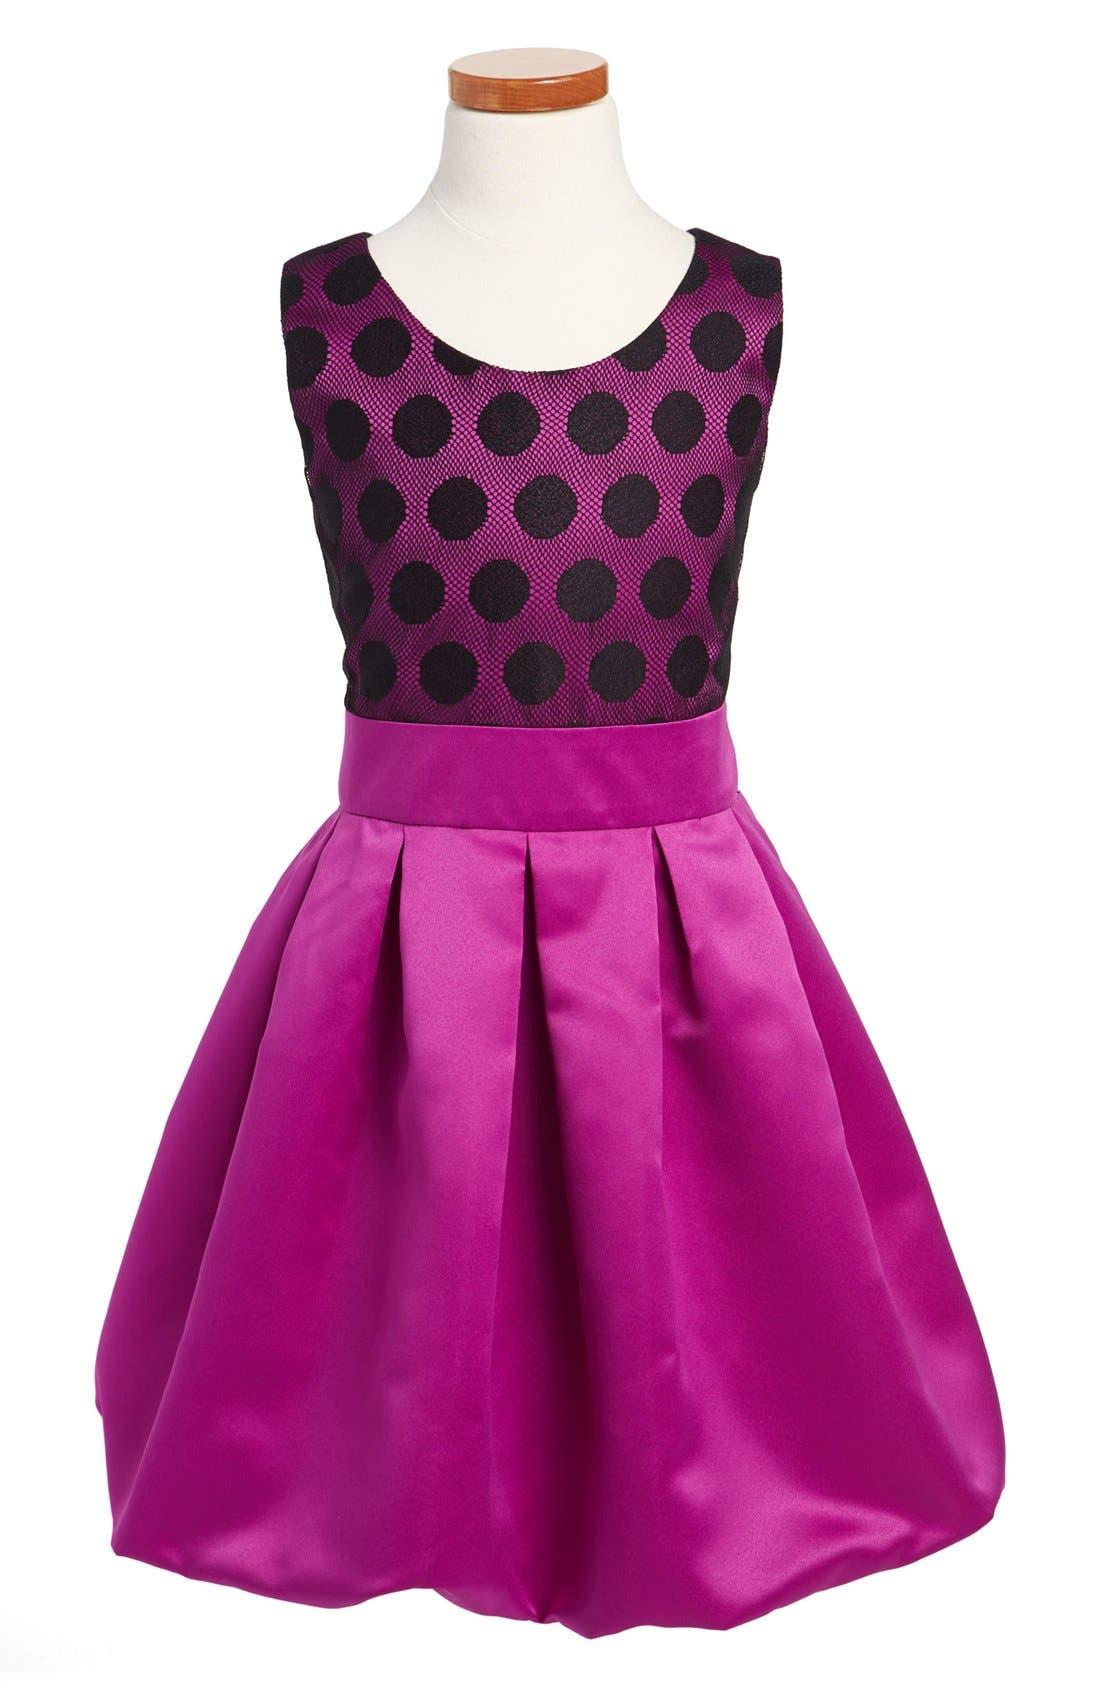 Alternate Image 1 Selected - Zoe Ltd Dot Satin Bubble Dress (Big Girls)